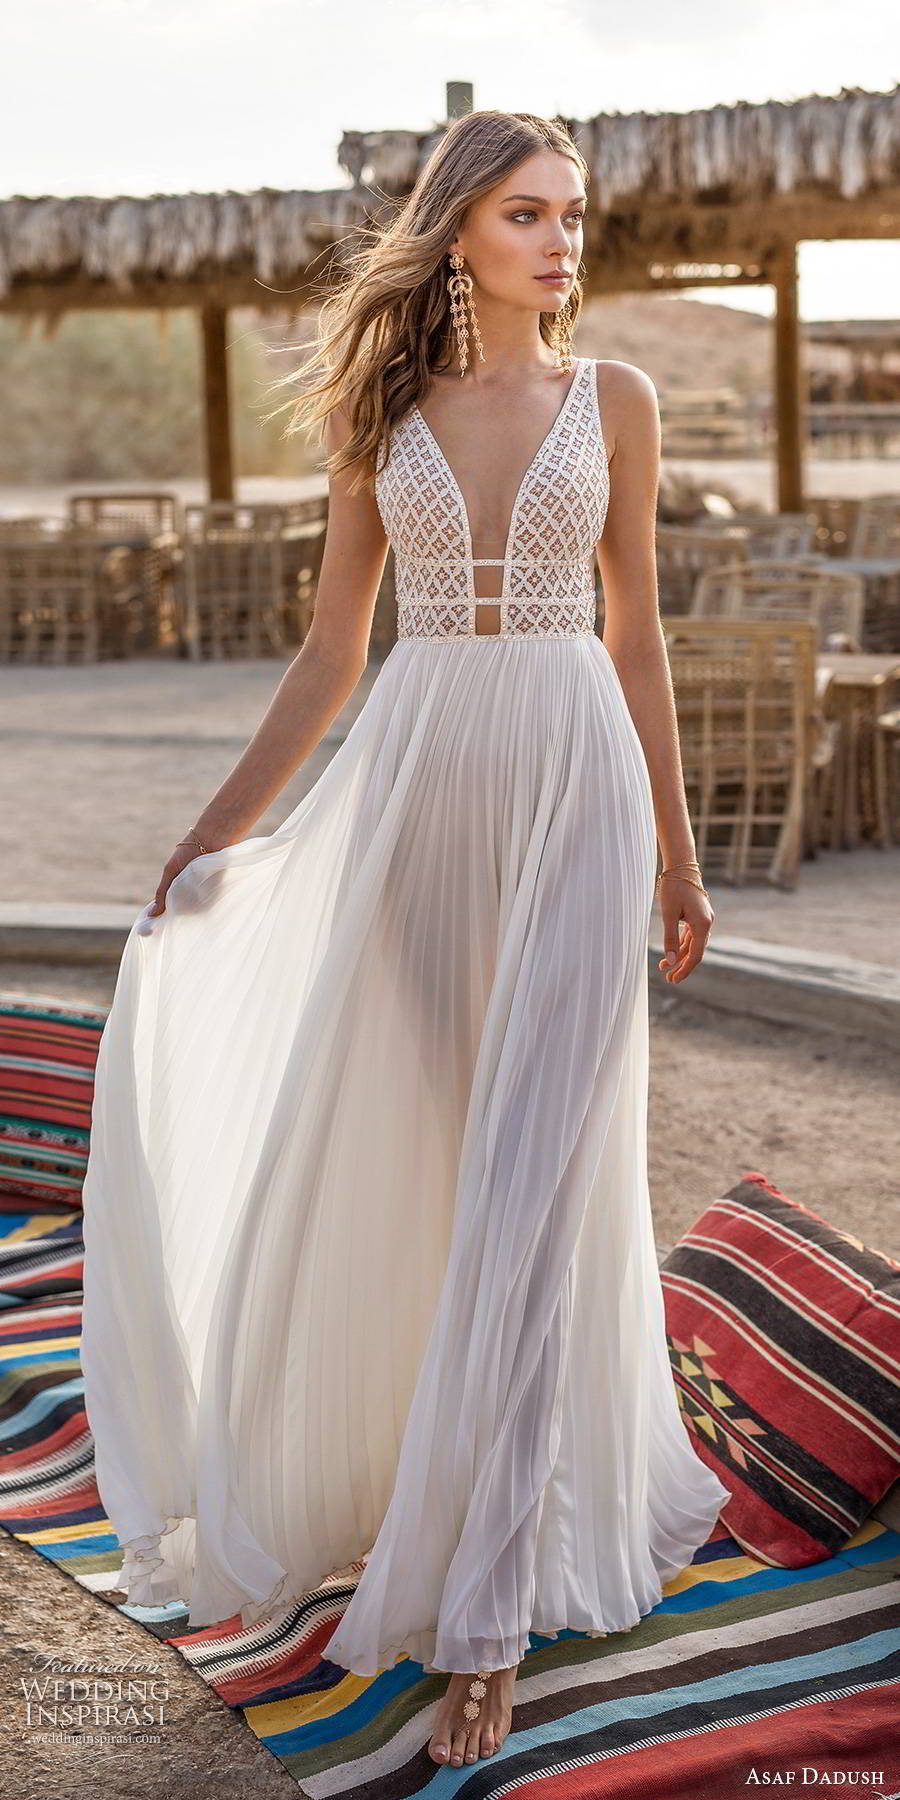 asaf dadush 2019 bridal sleeveless thick straps plunging v neckline embellished bodice pleated skirt soft a line wedding dress low back (4) mv